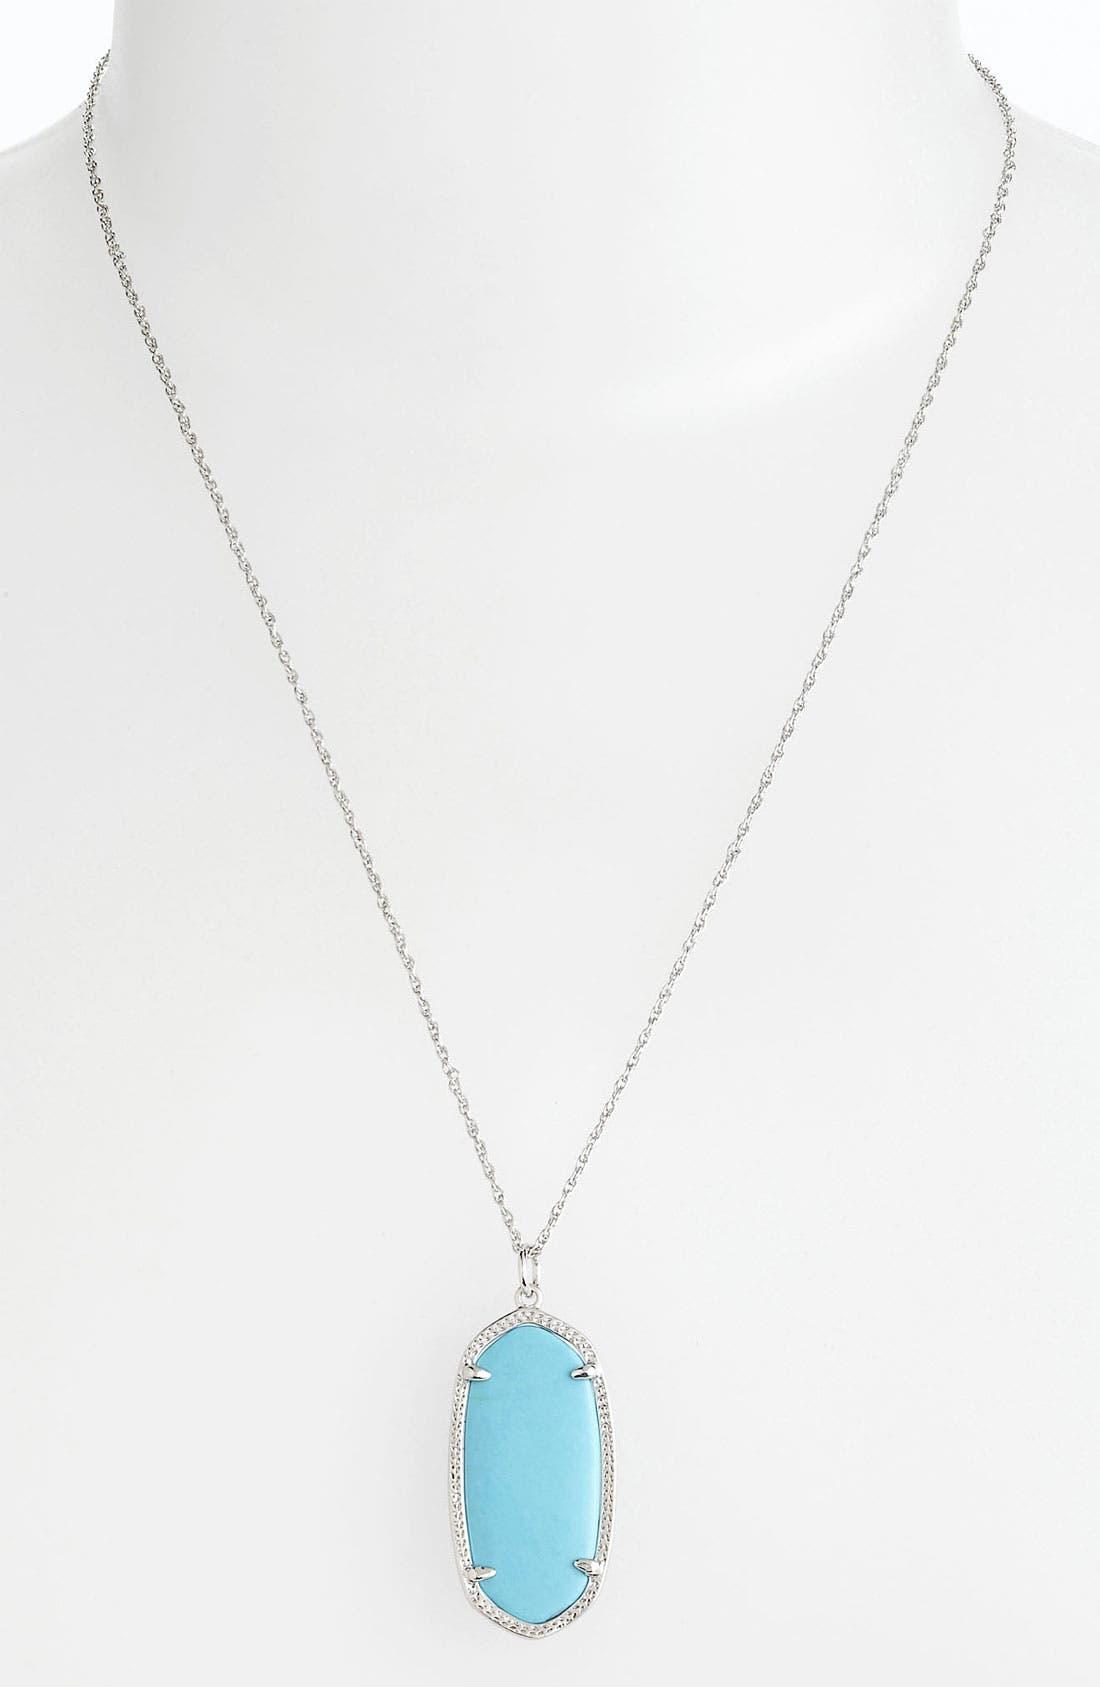 Main Image - Kendra Scott 'Elise' Pendant Necklace (Nordstrom Exclusive)